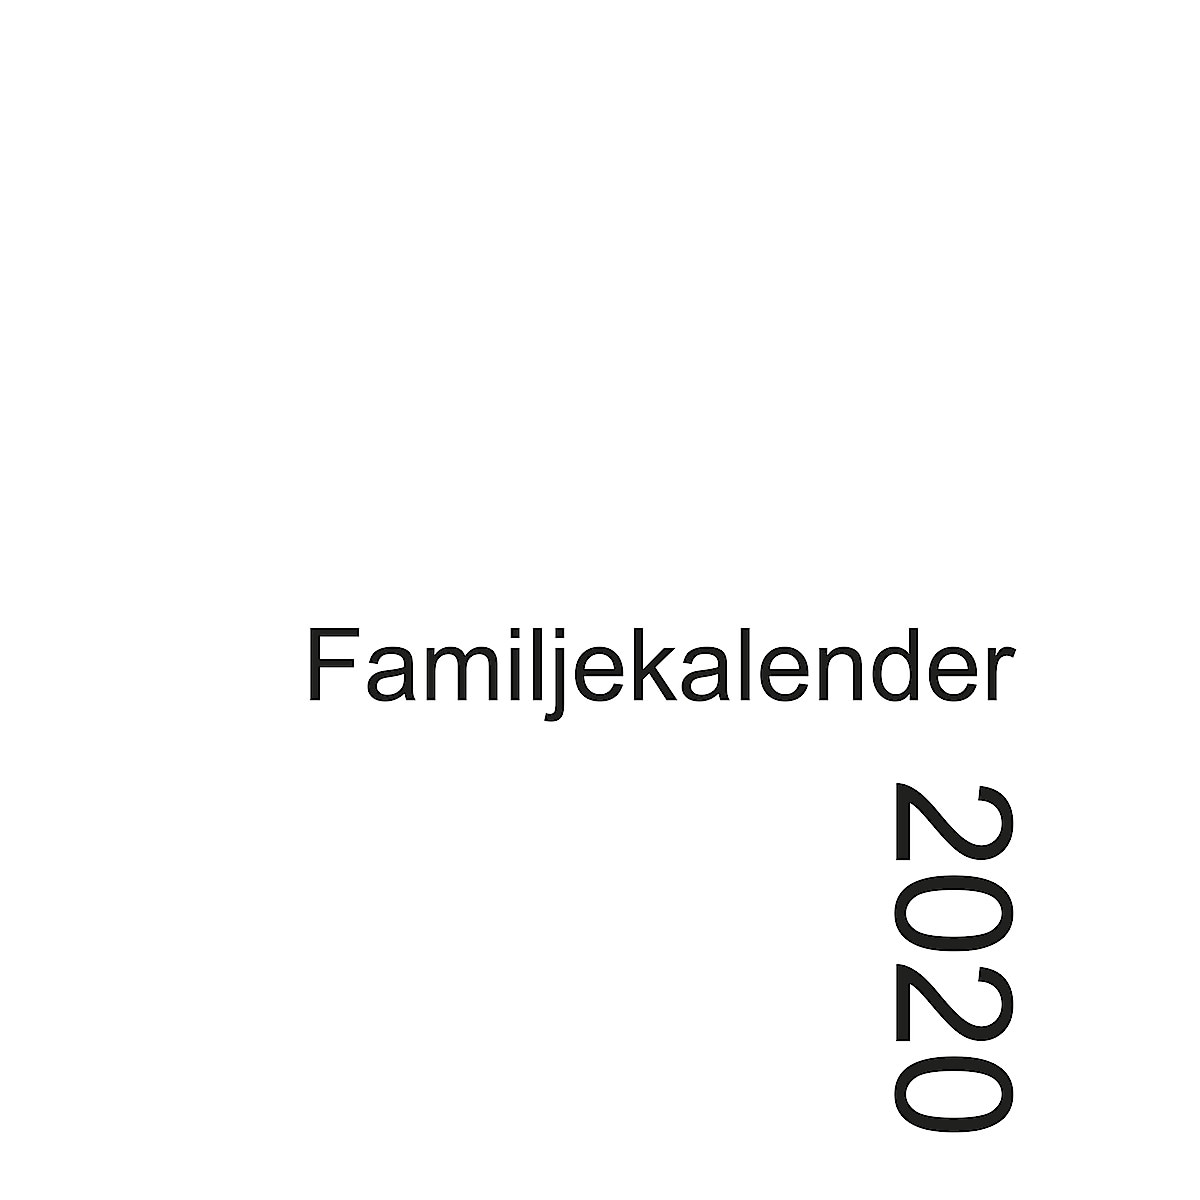 Familjekalender 2020 svenska